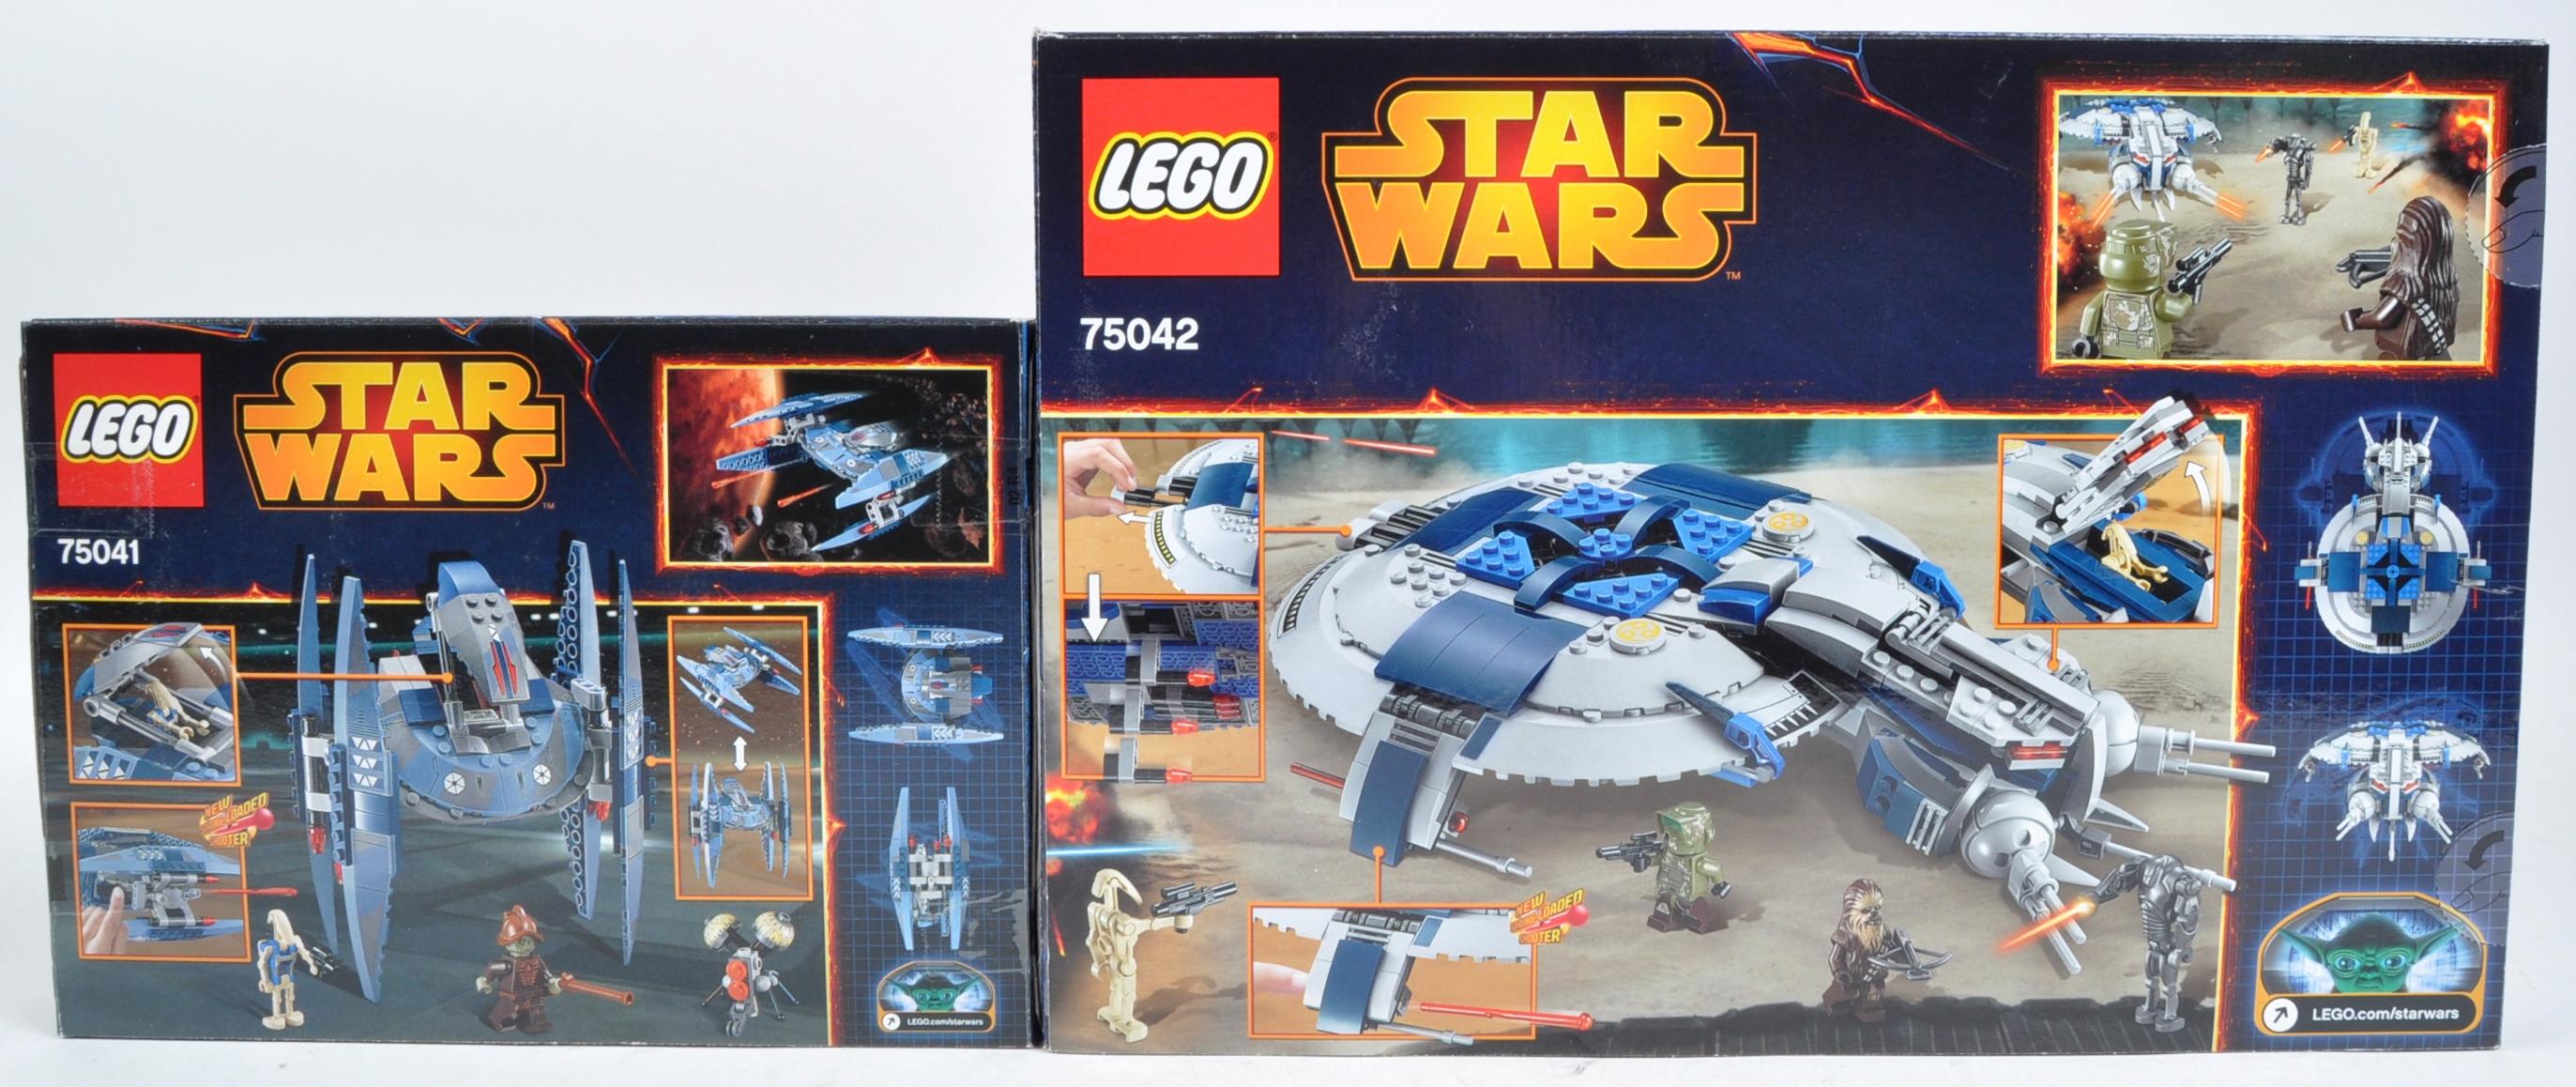 LEGO SETS - LEGO STAR WARS - 75041 / 75042 - Image 2 of 6